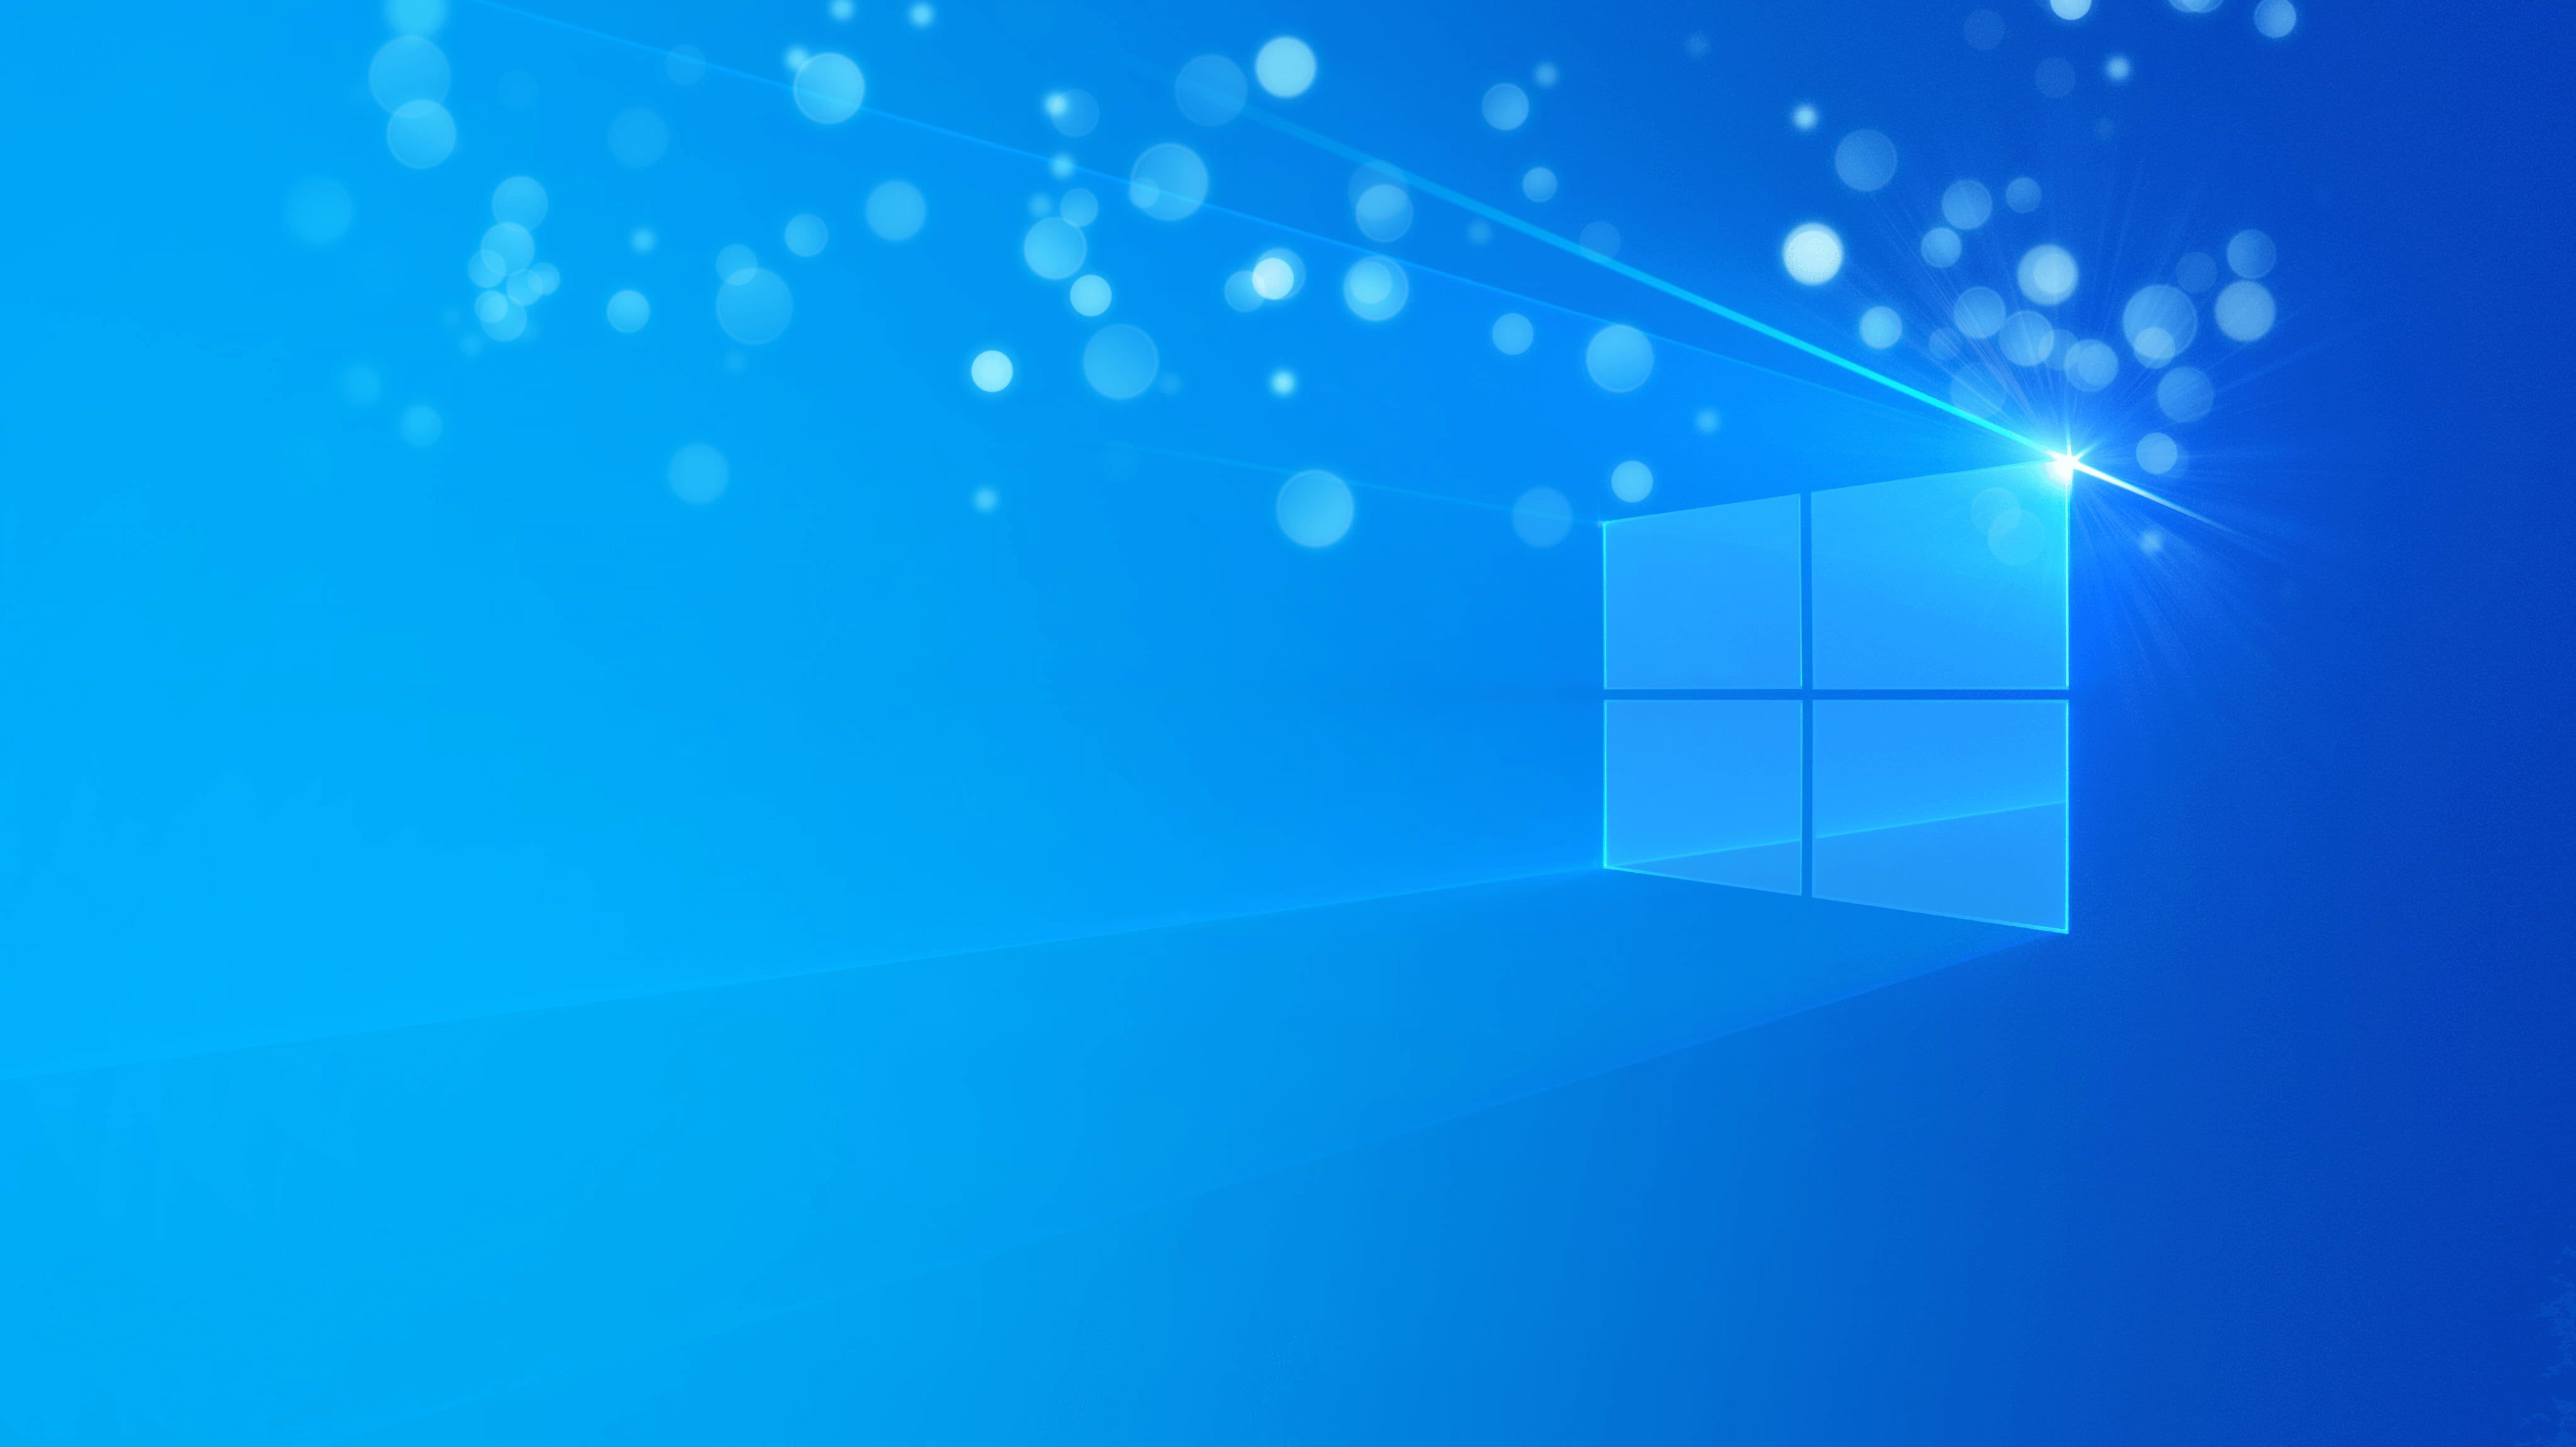 Windows 10 Anniversary Windows 10 Microsoft Windows Insider Program 4k Wallpaper Hdwallpaper Desktop Windows 10 Samsung Wallpaper Windows Wallpaper